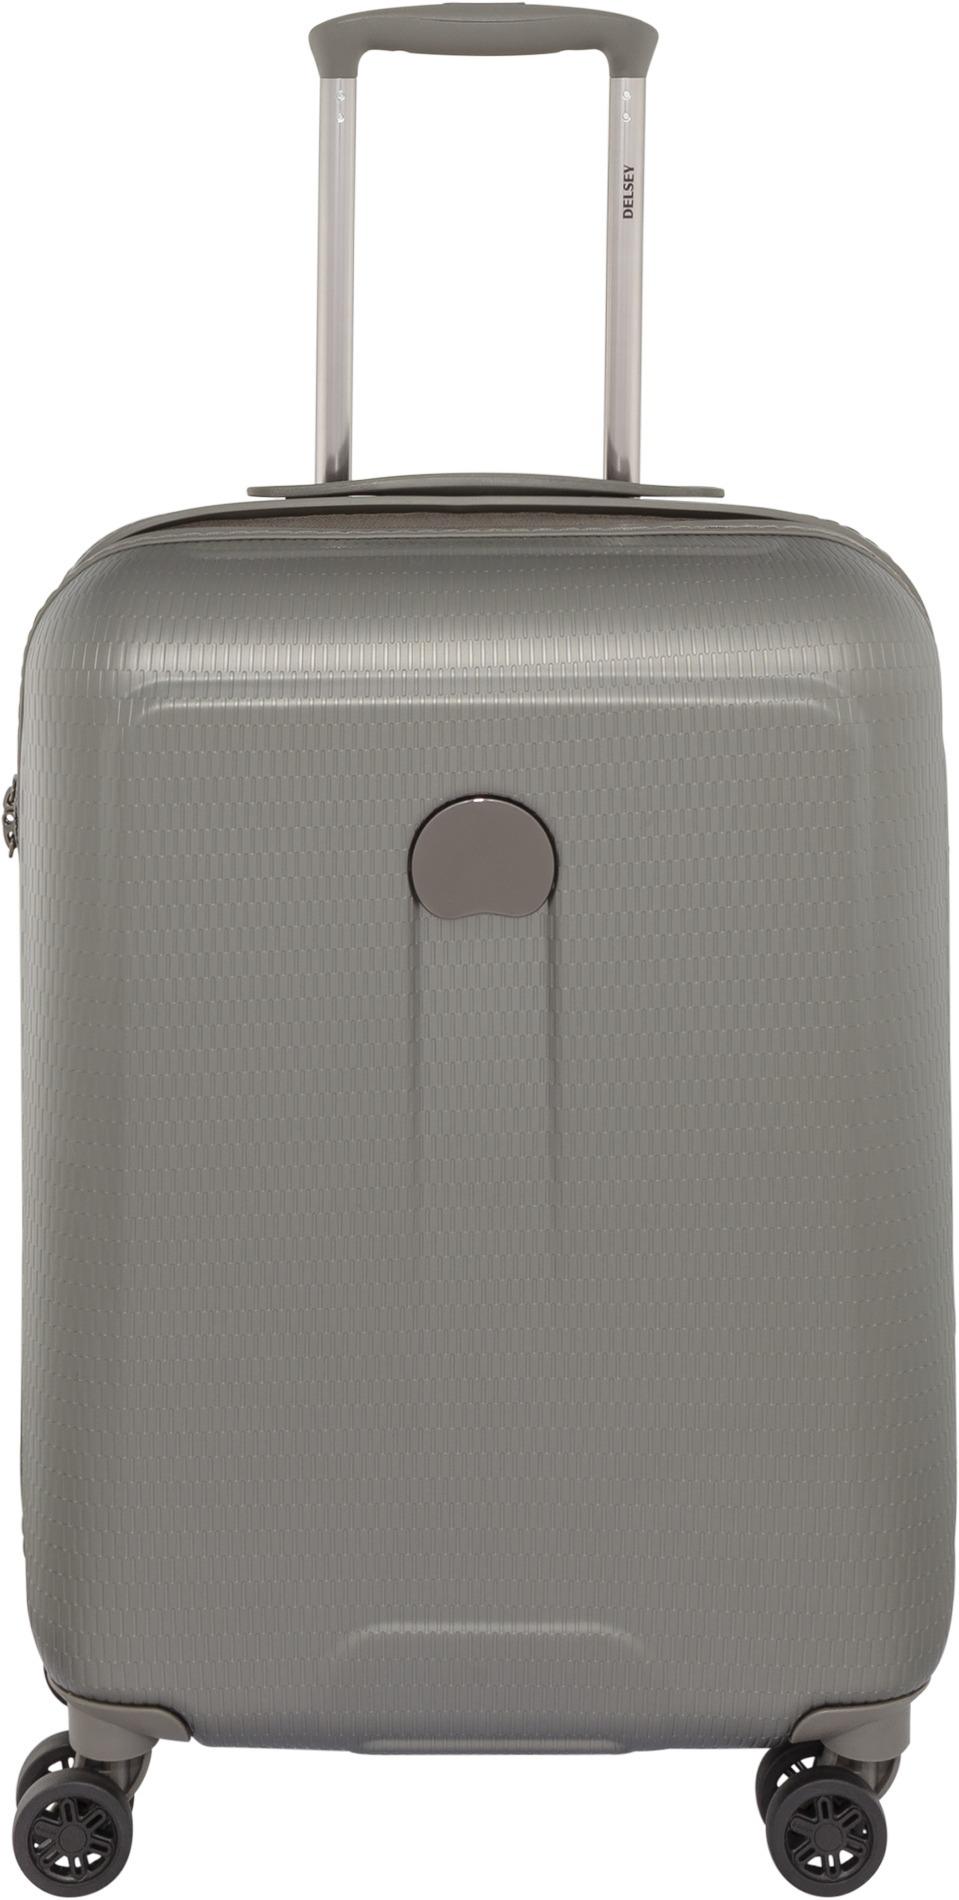 Чемодан Delsey Helium Air 2 Slim Cabin Trolley Case 55 см серый